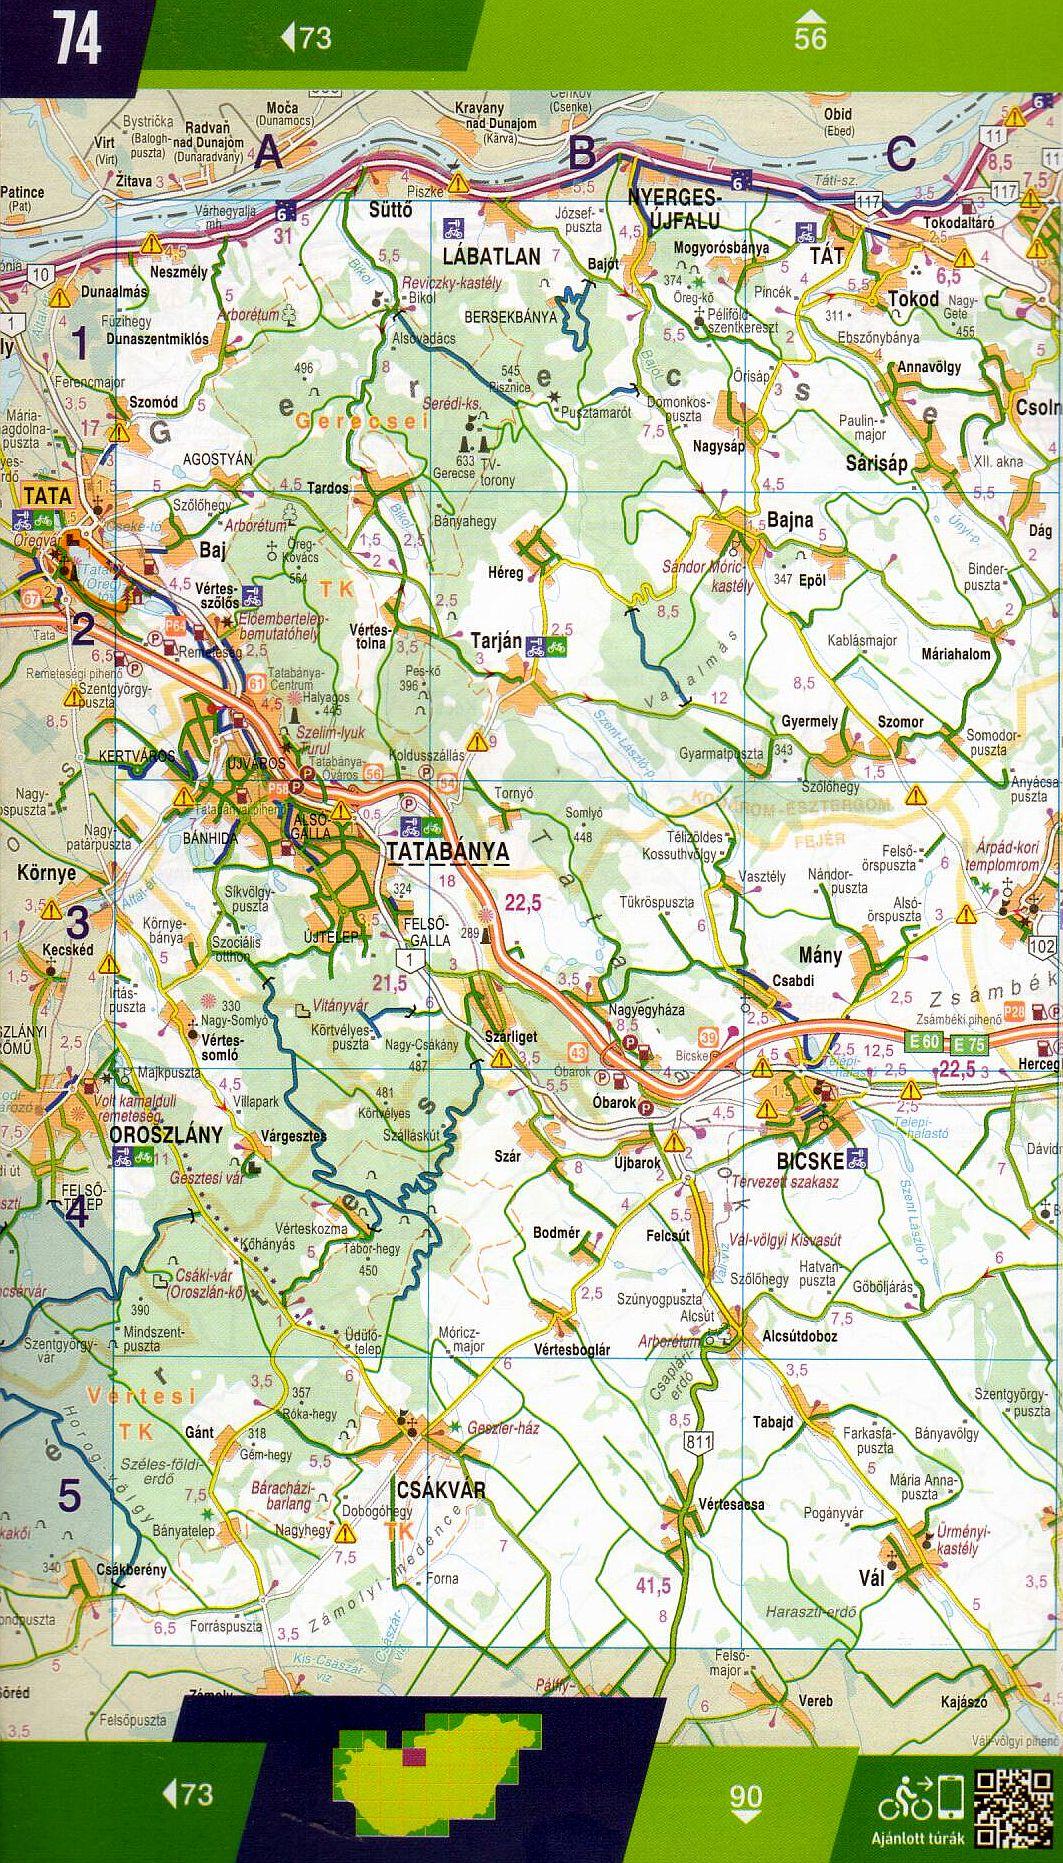 Hungary cycling guide/atlas: map sample 1